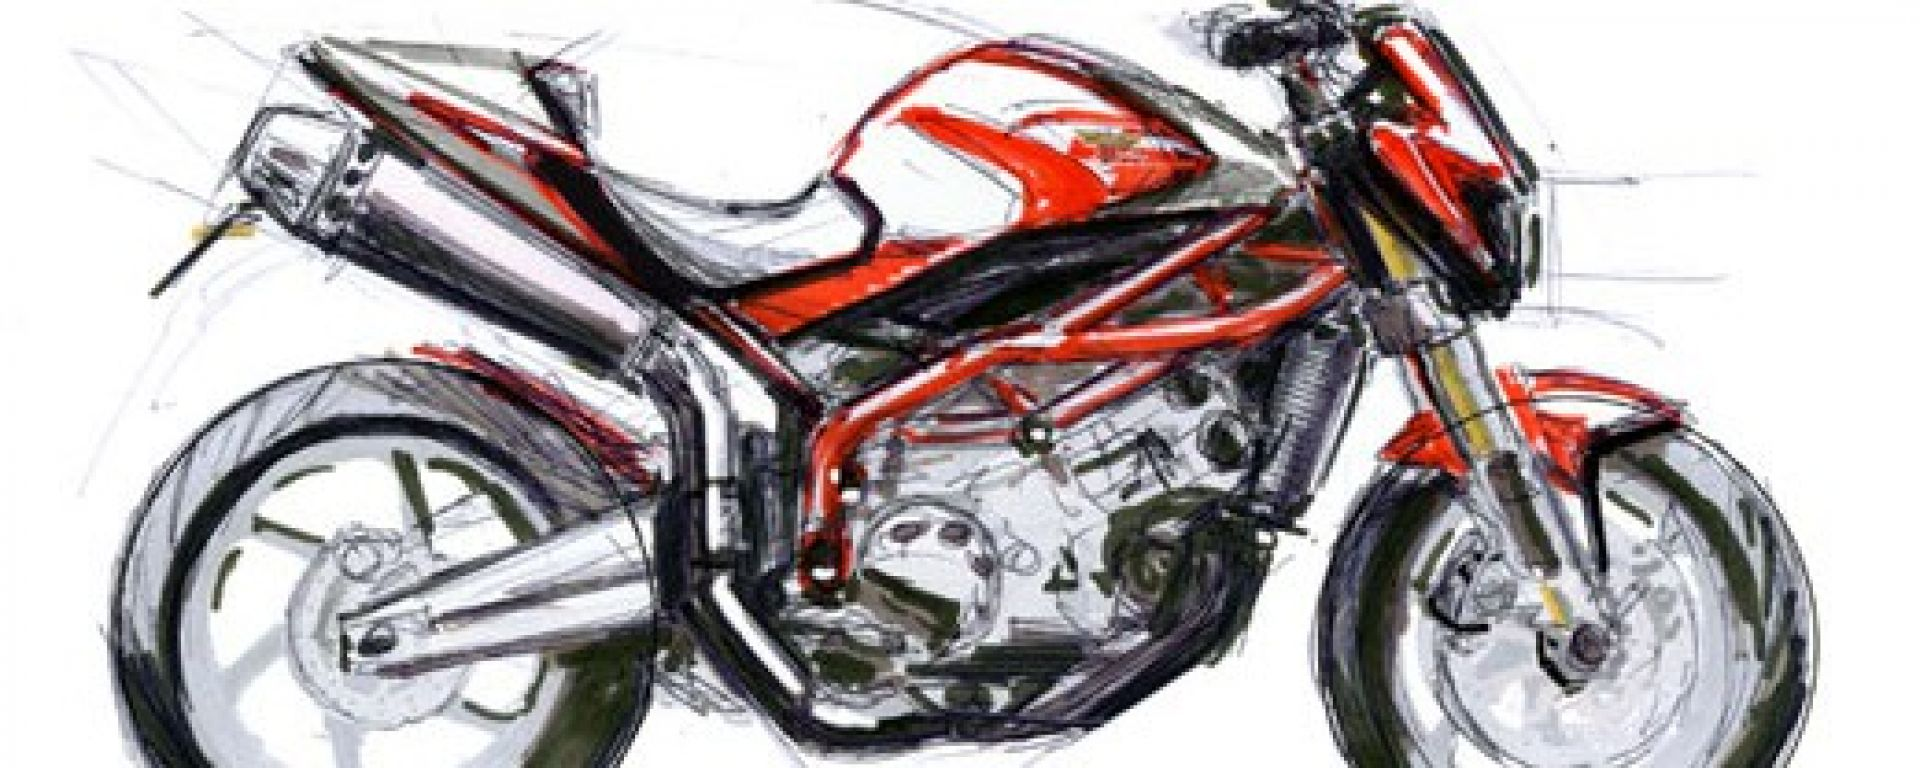 Moto Morini: i primi disegni